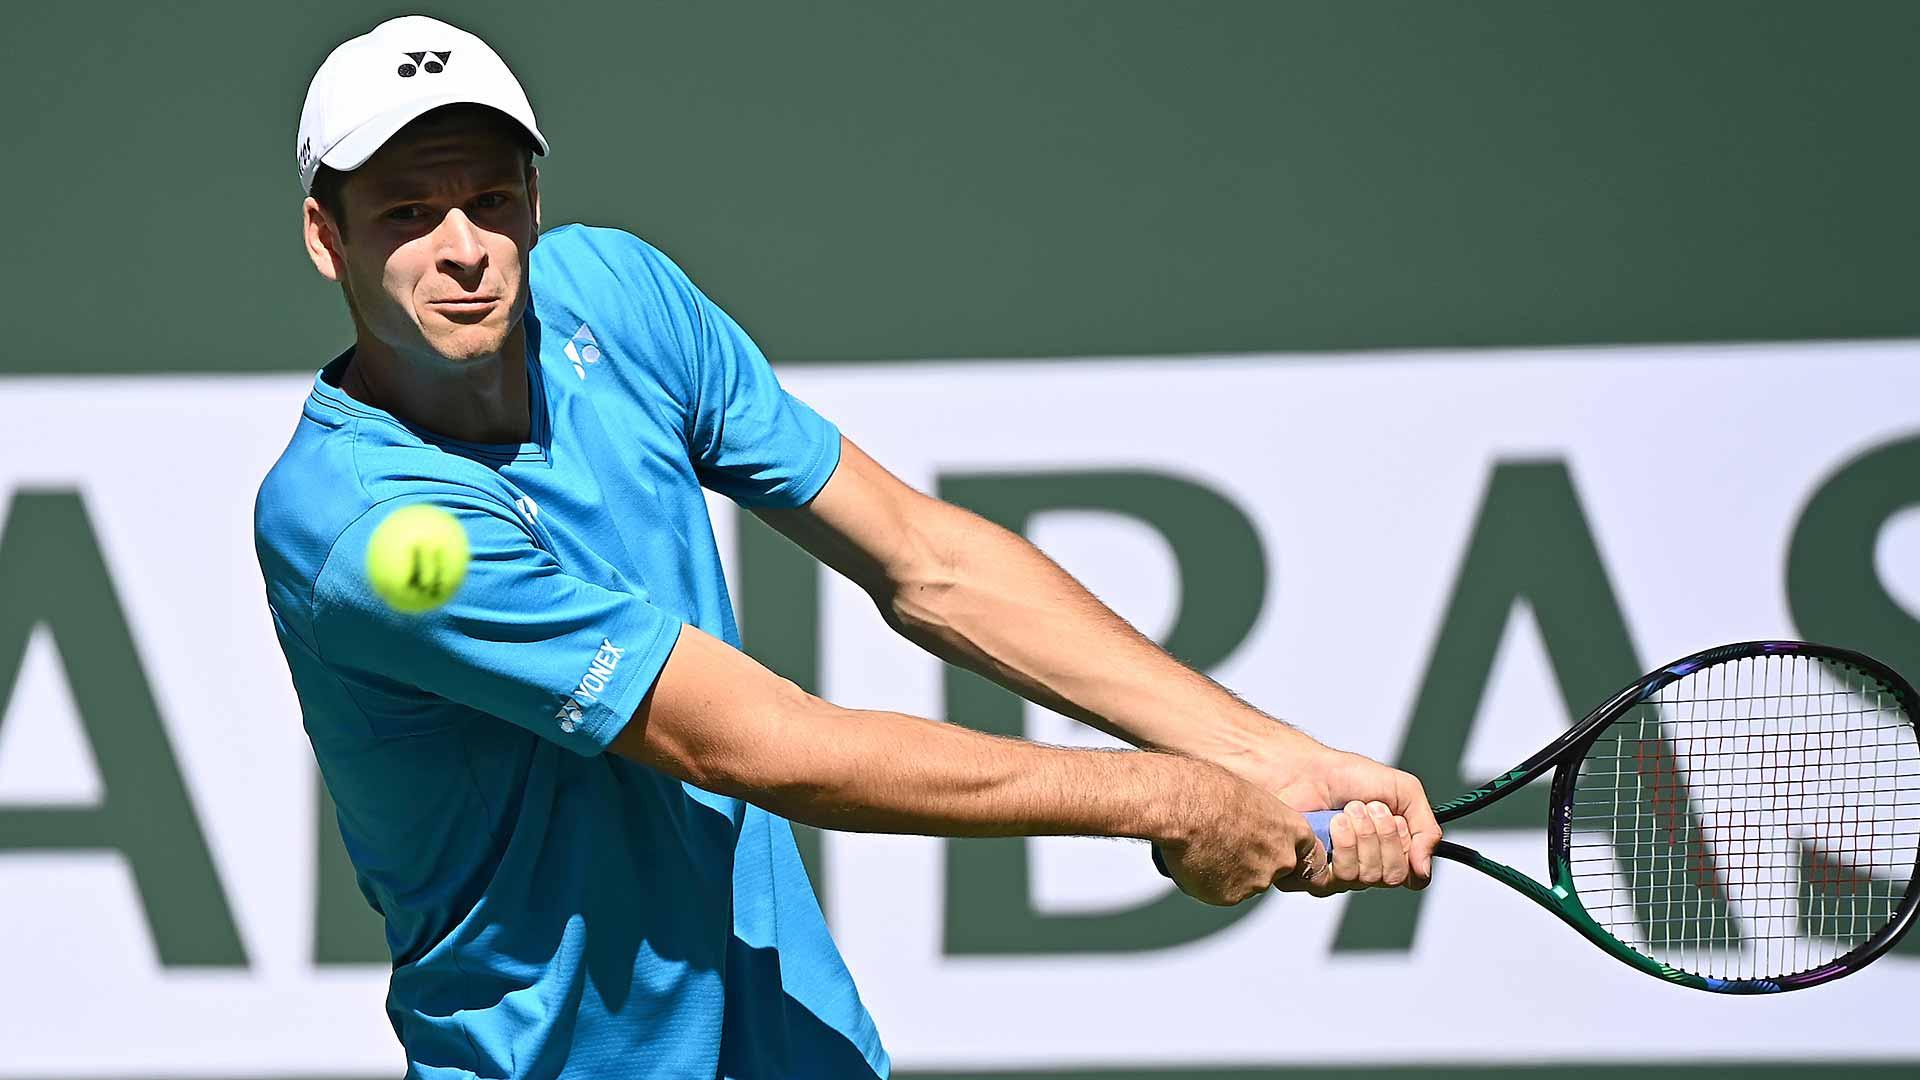 Indian Wells 2021: Hubert Hurkacz vs. Grigor Dimitrov Tennis Pick and Prediction